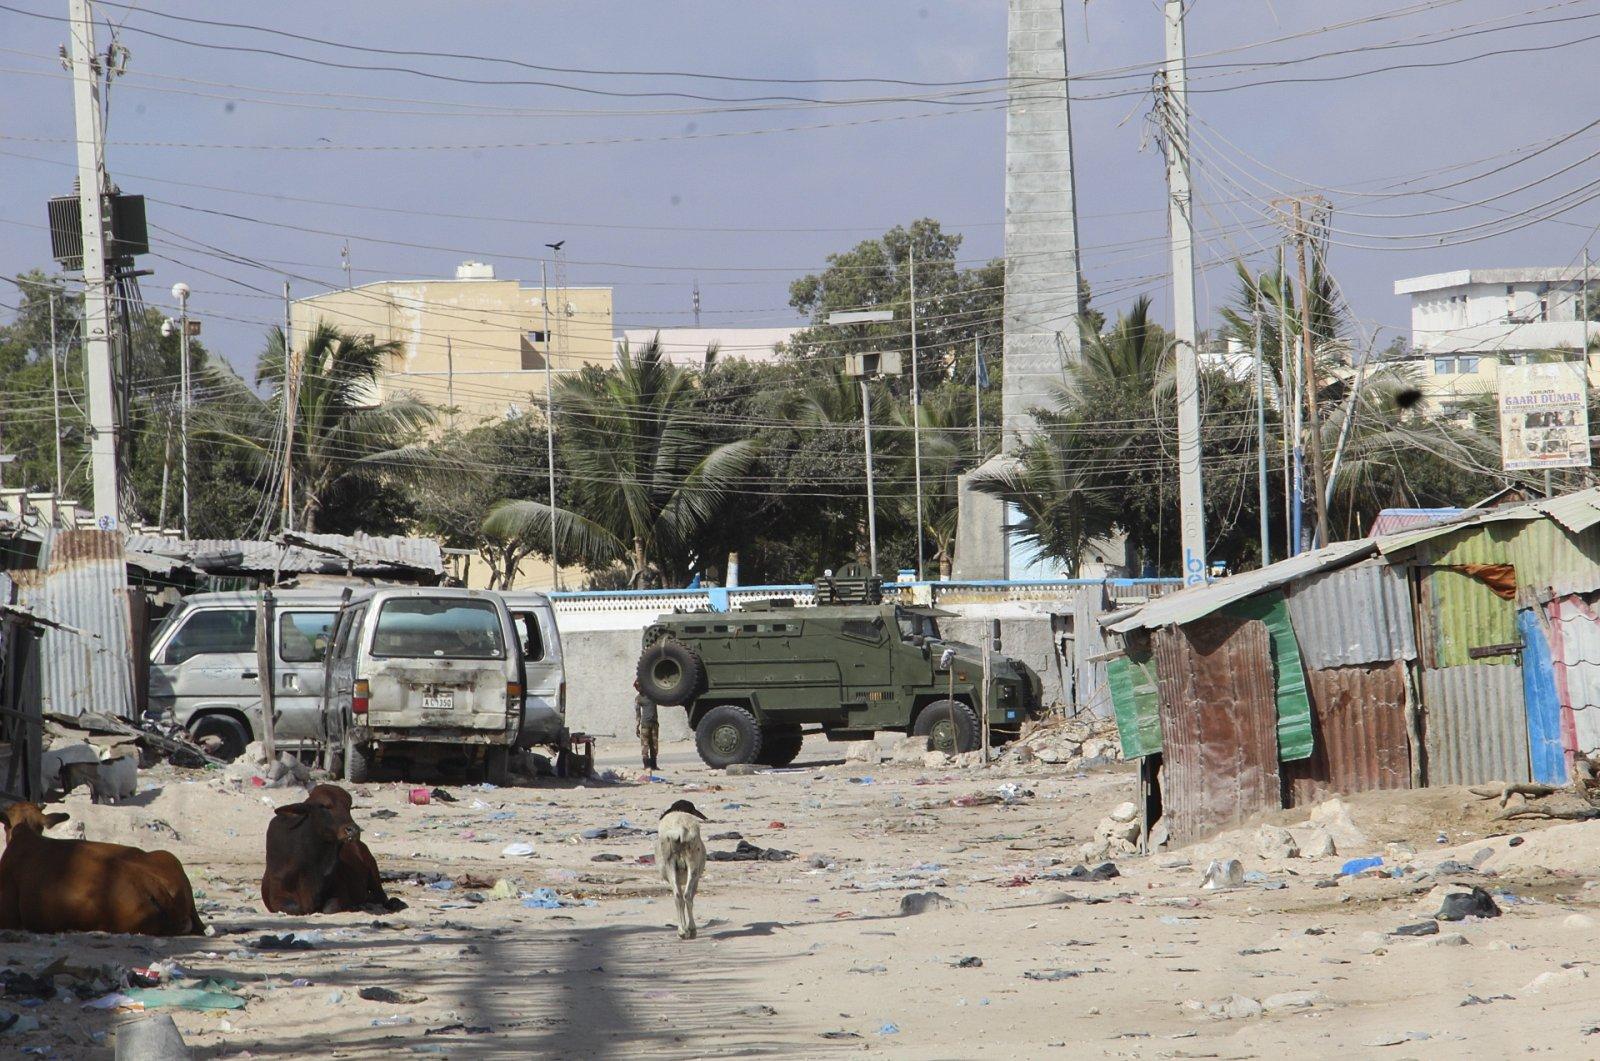 Somali military forces seal off a road near the Somali presidential palace in Mogadishu, Somalia, Feb. 19, 2021. (EPA Photo)